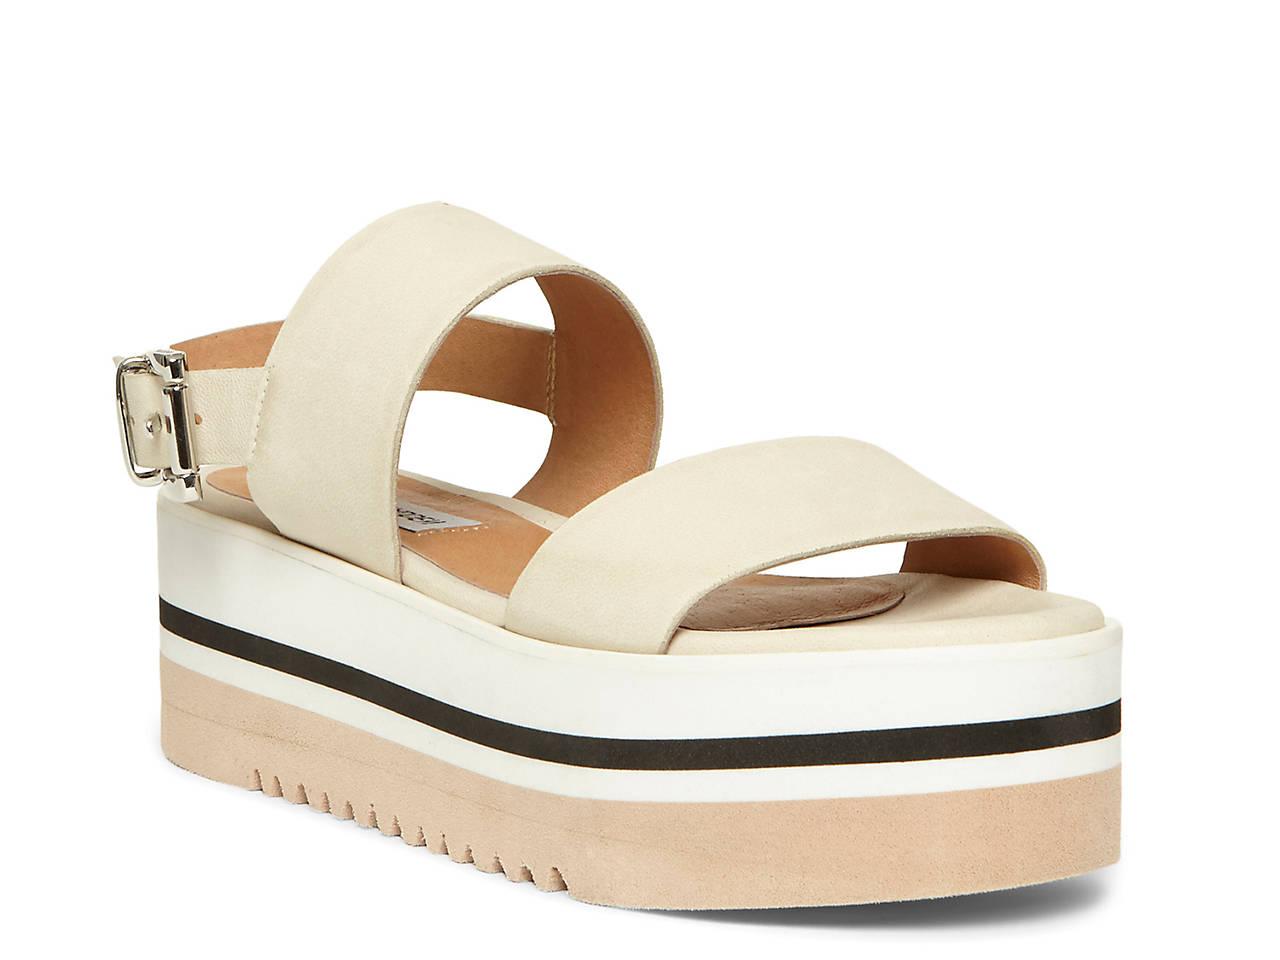 951906d0639 Adora Platform Sandal